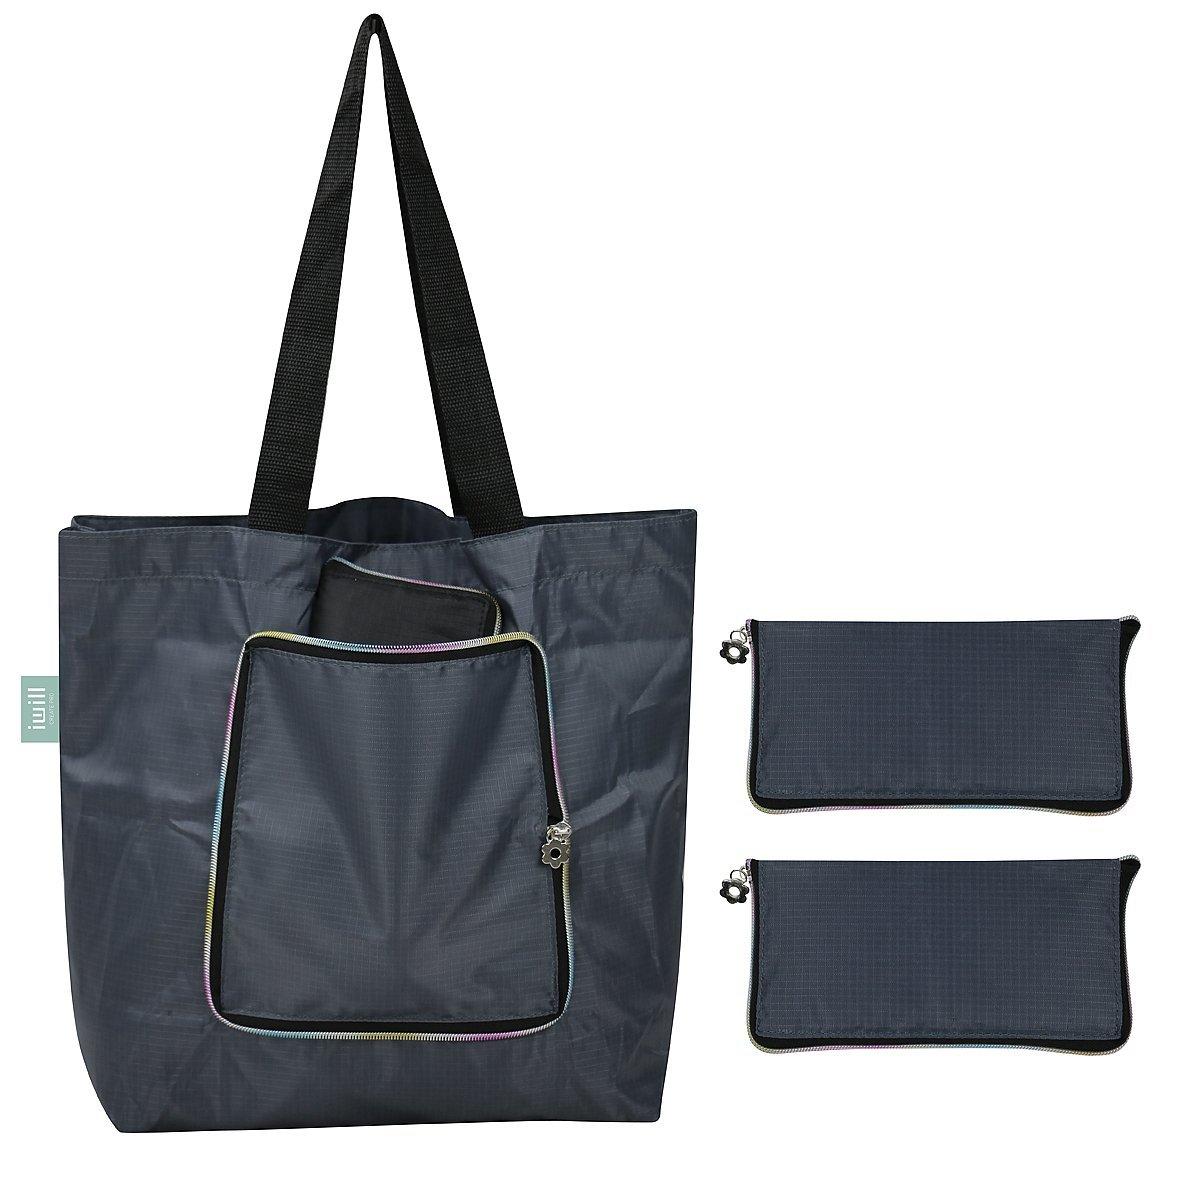 Sac bandoulière léger en polyester, sac à bandoulière, sac à bandoulière, paquet de 2, gris foncé I WILL